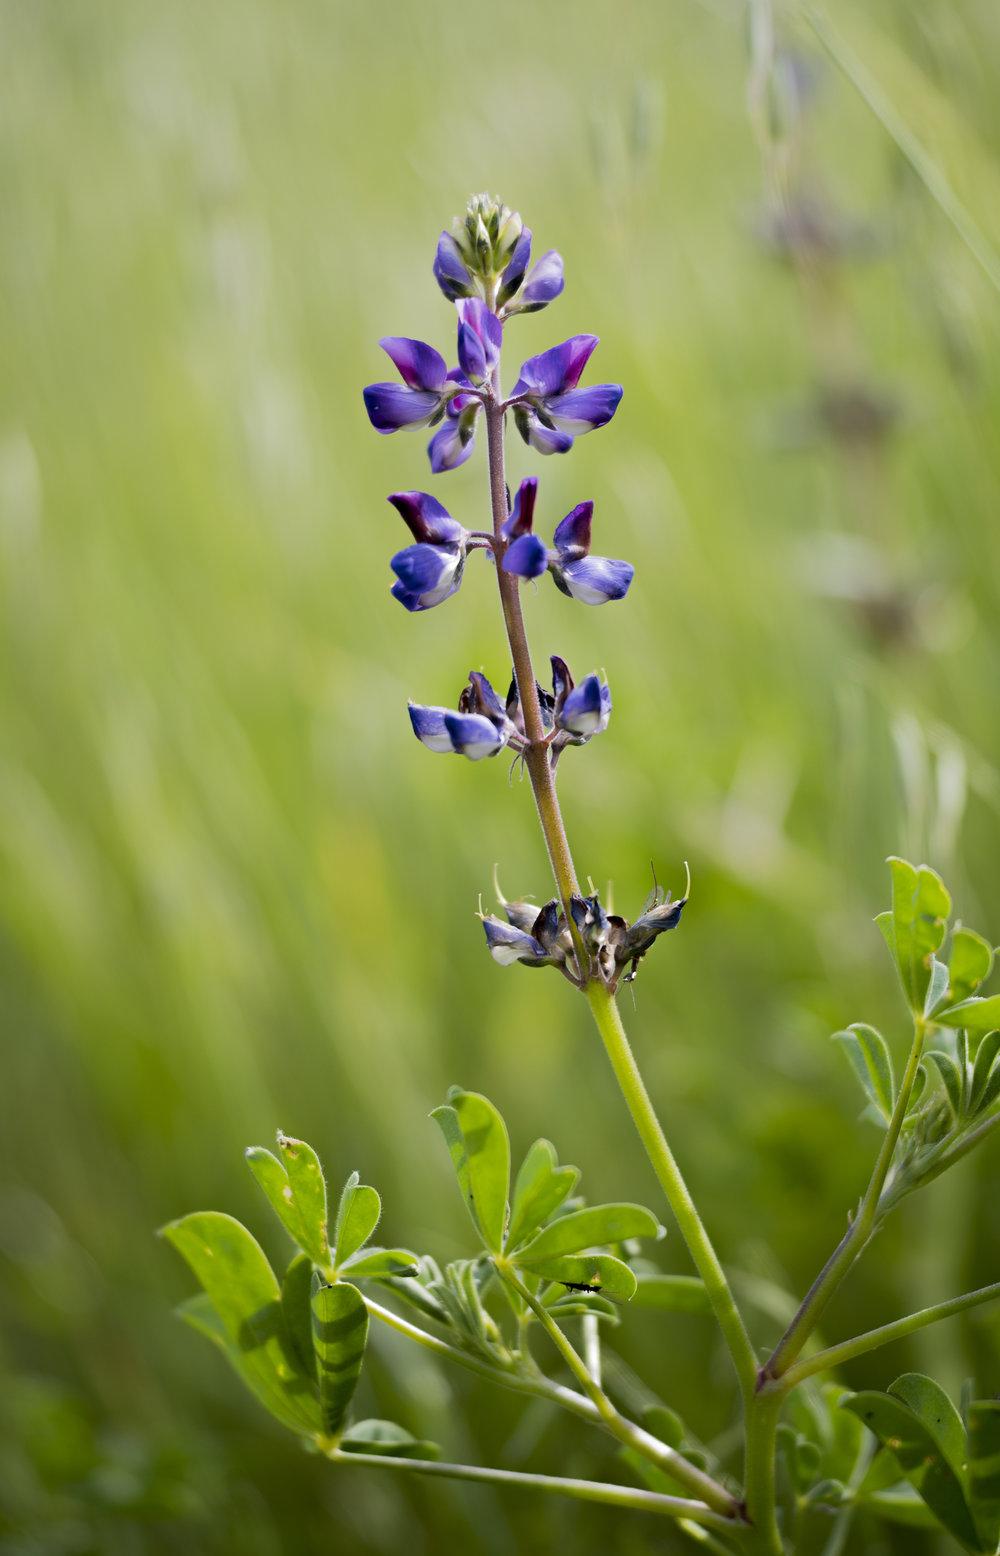 Sky Lupine, Wildflower at Santa Teresa County Park, San Jose, California